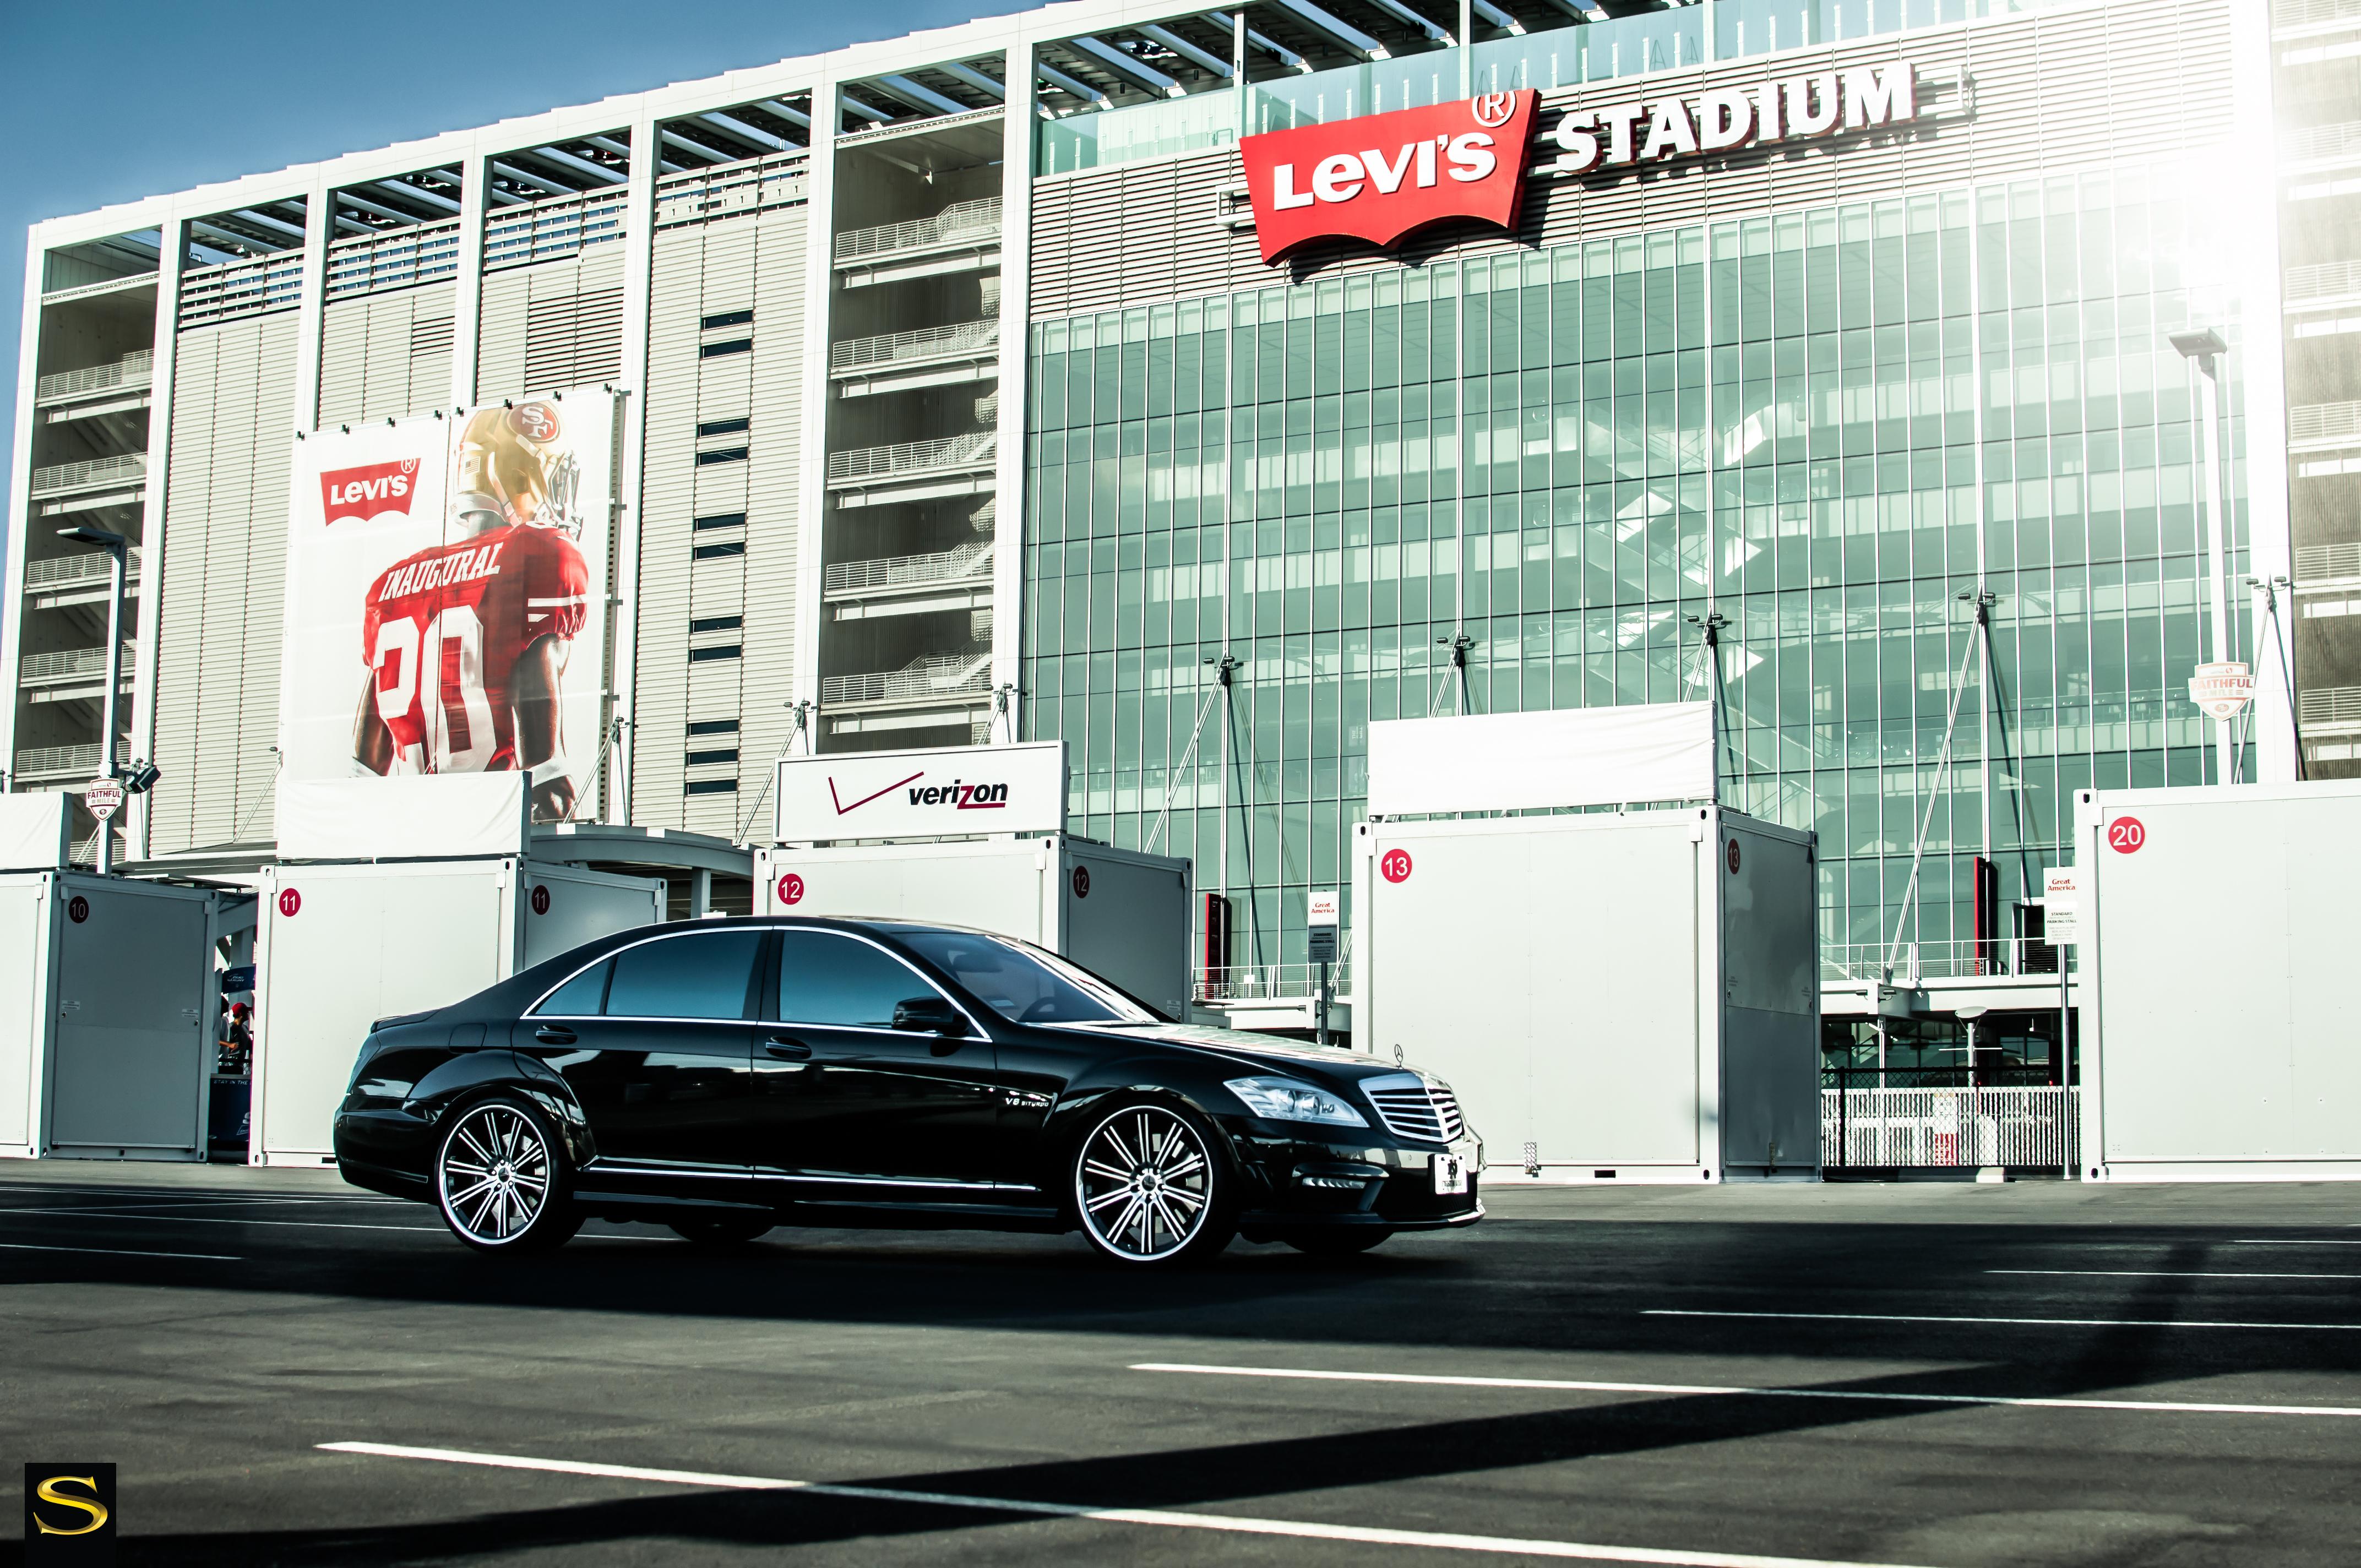 Black-California-Wheels-Mercedes-Benz-S63-Saini-Wheels-Black di-Forza-BM3-Machined-Black-Stainless-Steel-5